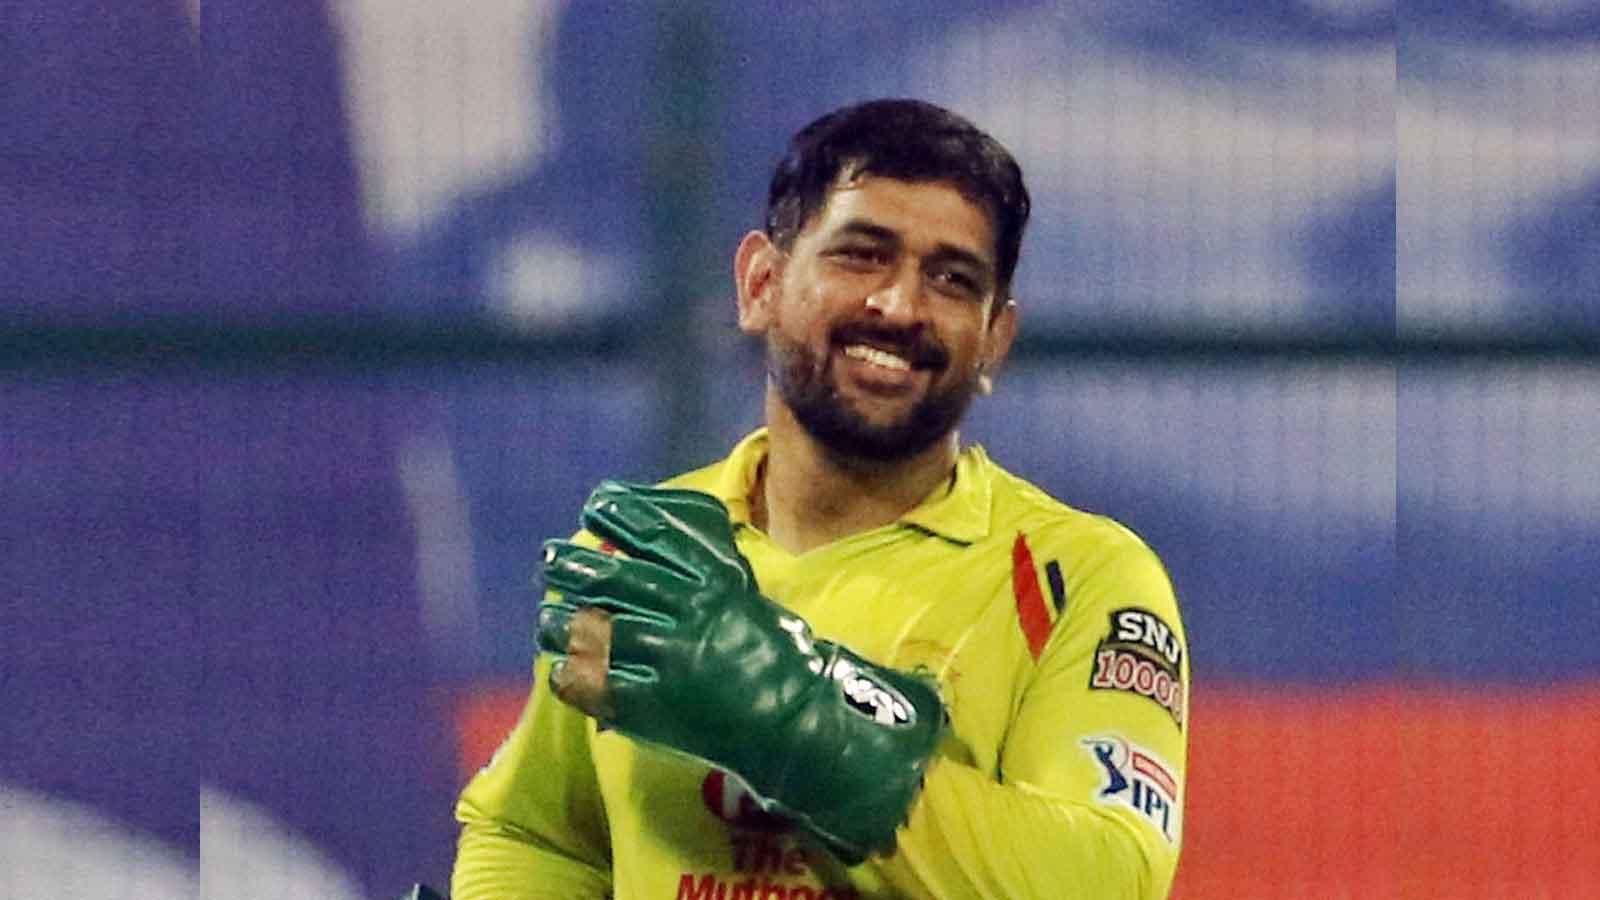 csk-likely-to-retain-ms-dhoni-as-captain-in-ipl-2021-gautam-gambhir